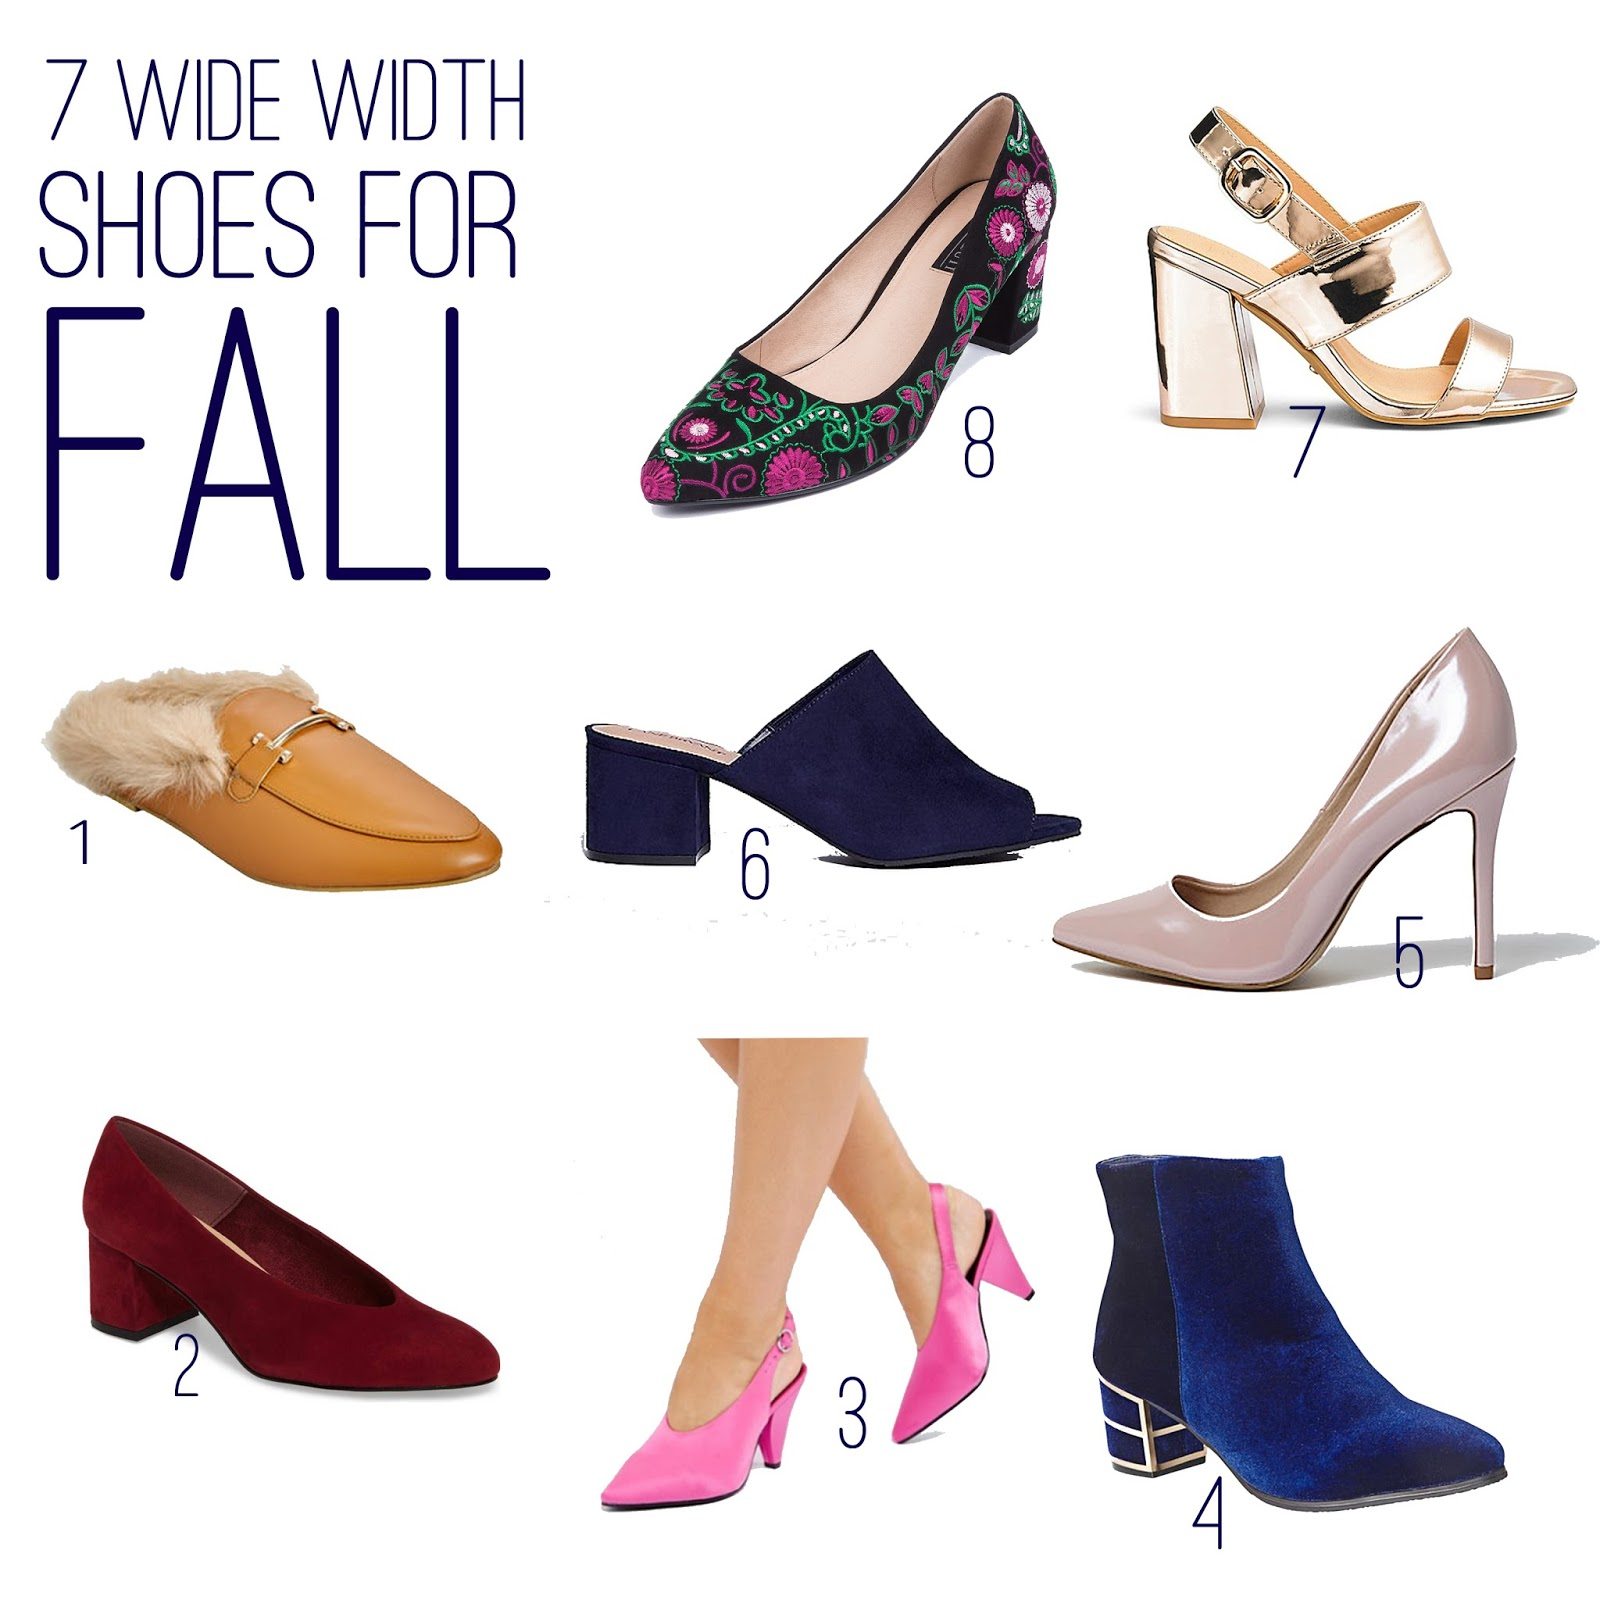 cc75de06926 7 Wide Width Shoes for Fall - Garnerstyle